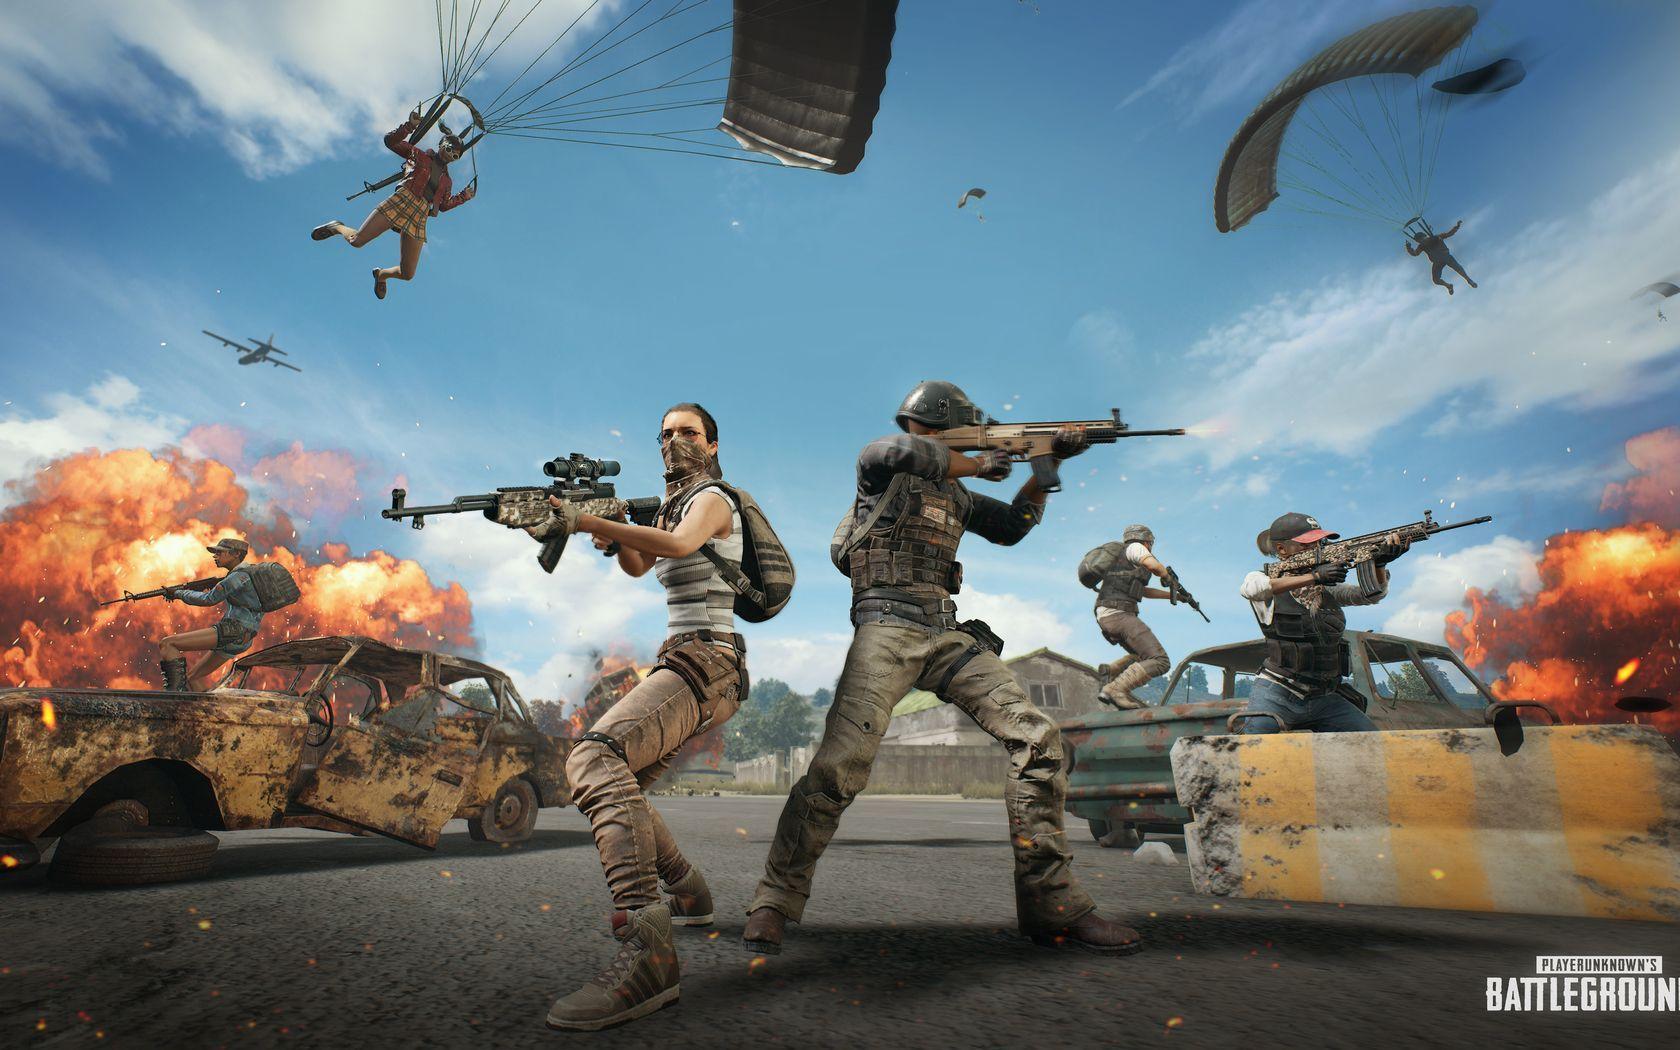 Player Unknowns Battlegrounds Pubg 4k Pubg Wallpaper